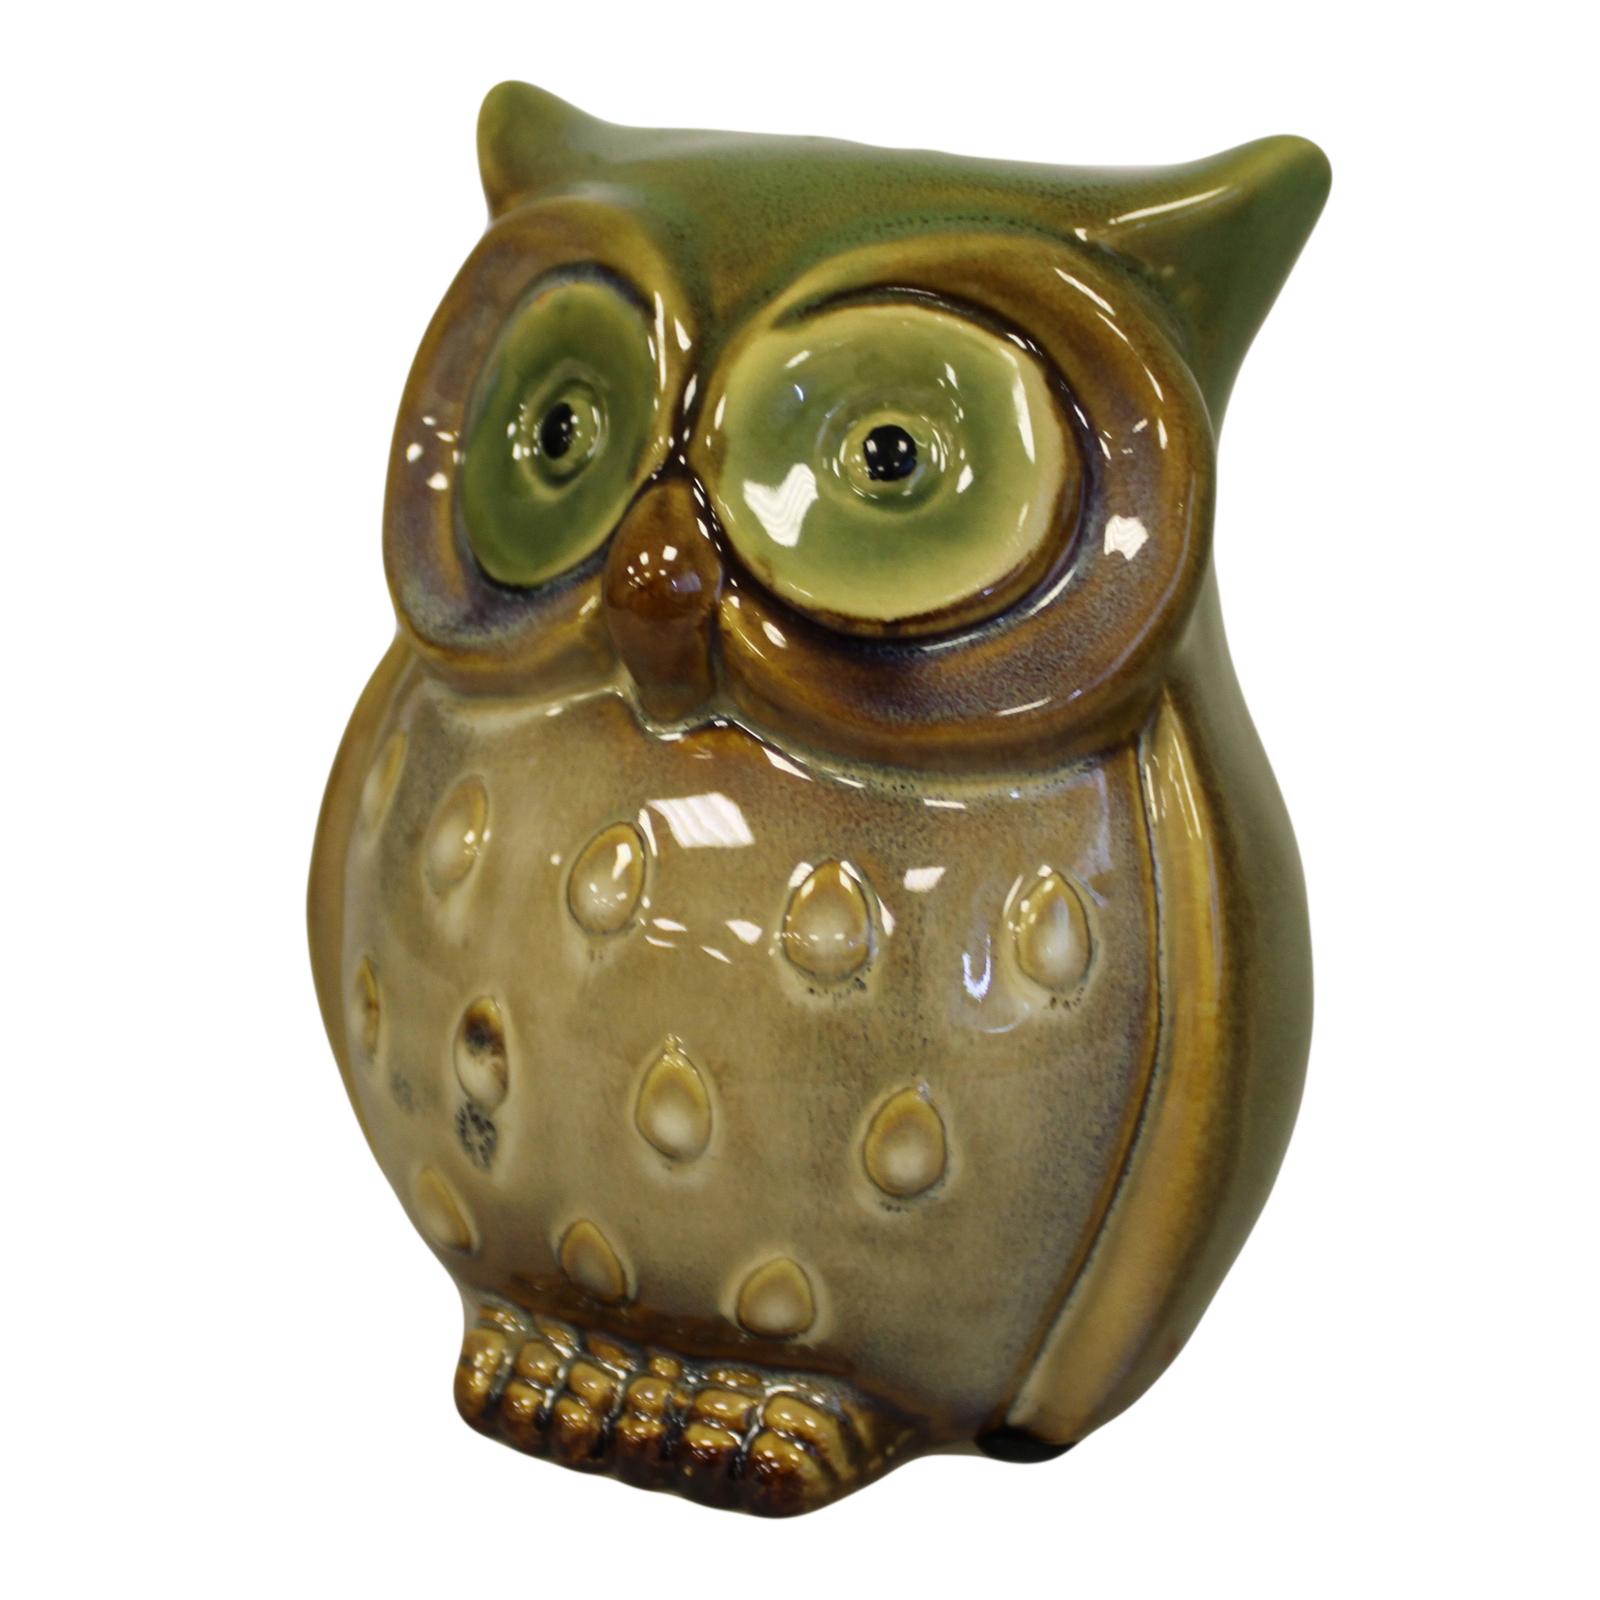 Ceramic Owl Bank - Green